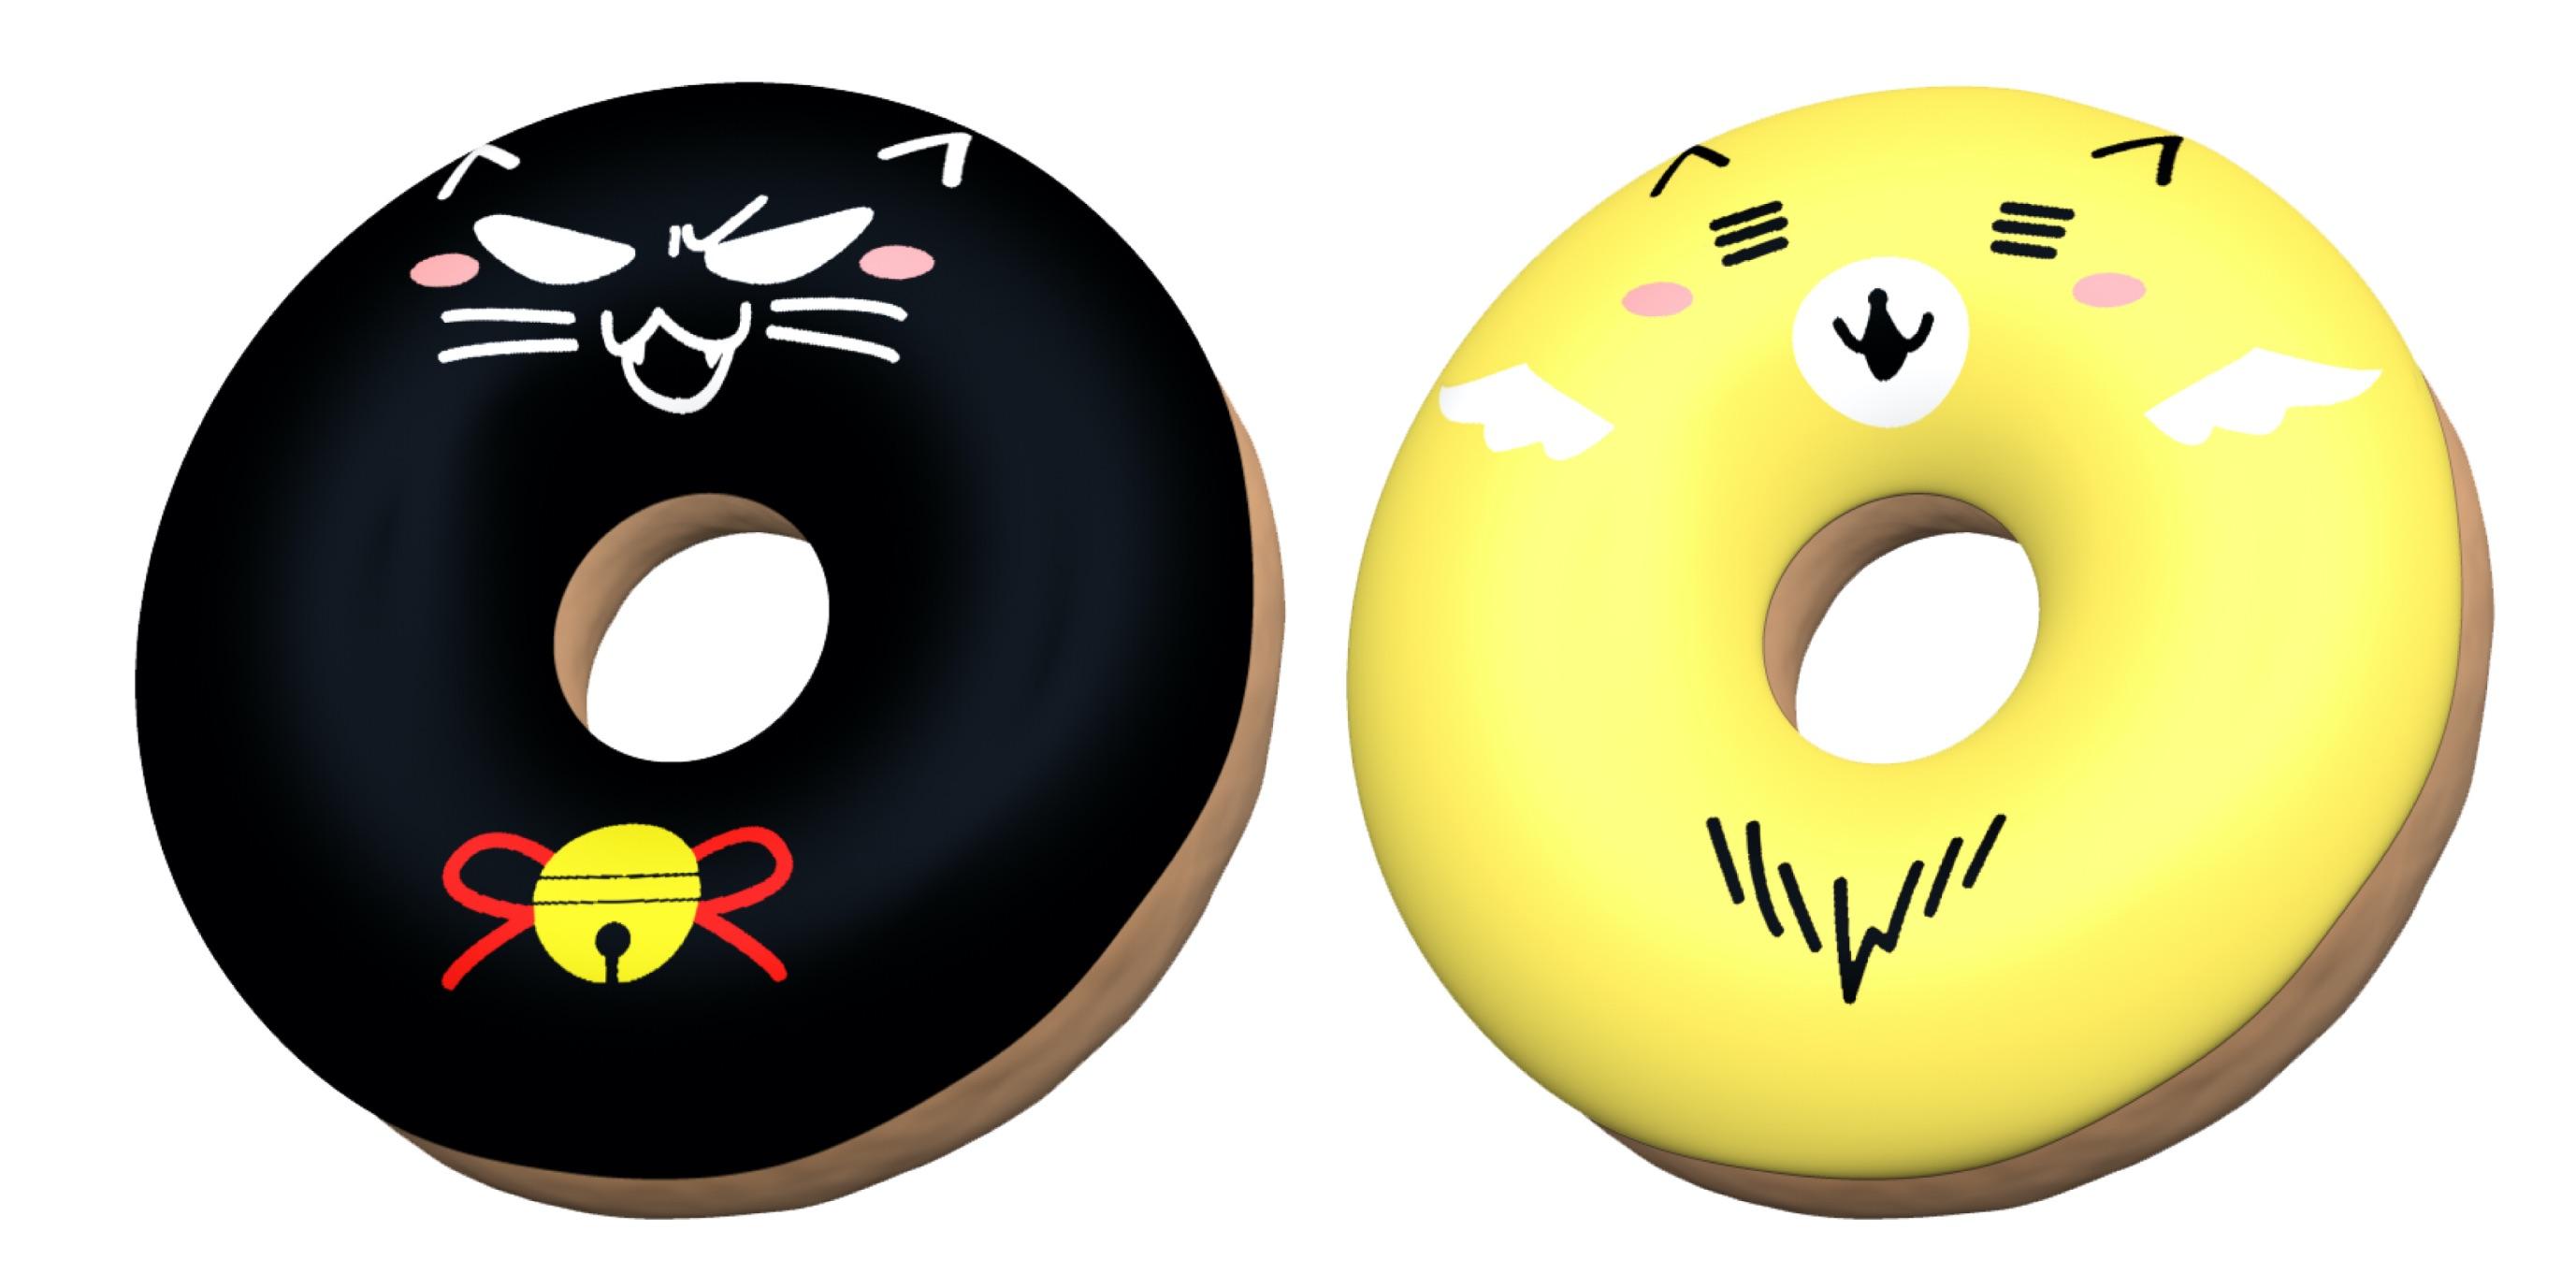 animate-cafe-doughnuts-%e3%82%a2%e3%83%8b%e3%83%a1%e3%82%a4%e3%83%88%e3%82%ab%e3%83%95%e3%82%a7%e3%83%89%e3%83%bc%e3%83%8a%e3%83%84-animate-%e5%92%96%e5%95%a1%e9%a4%a8%e7%94%9c%e7%94%9c%e5%9c%886-2